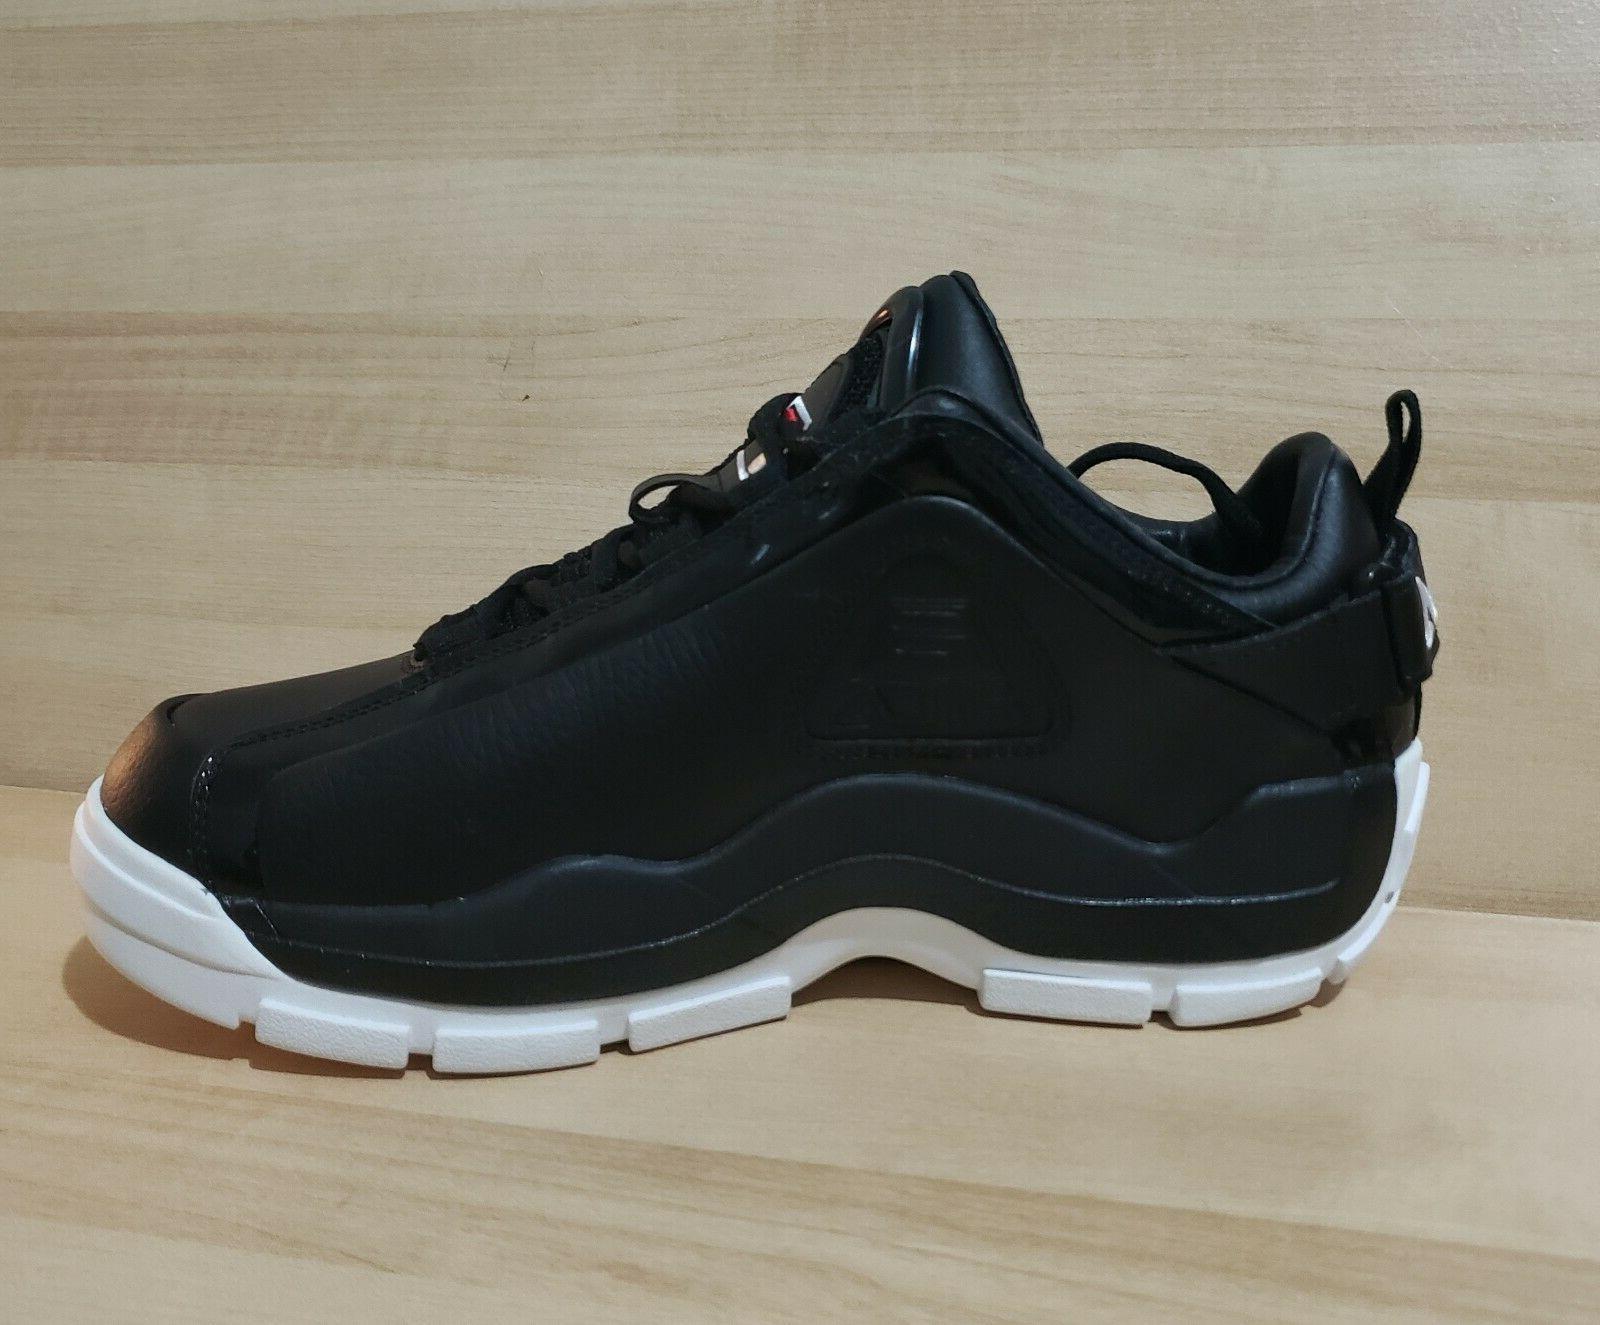 FILA Low GRANT HILL Shoes 13 Black